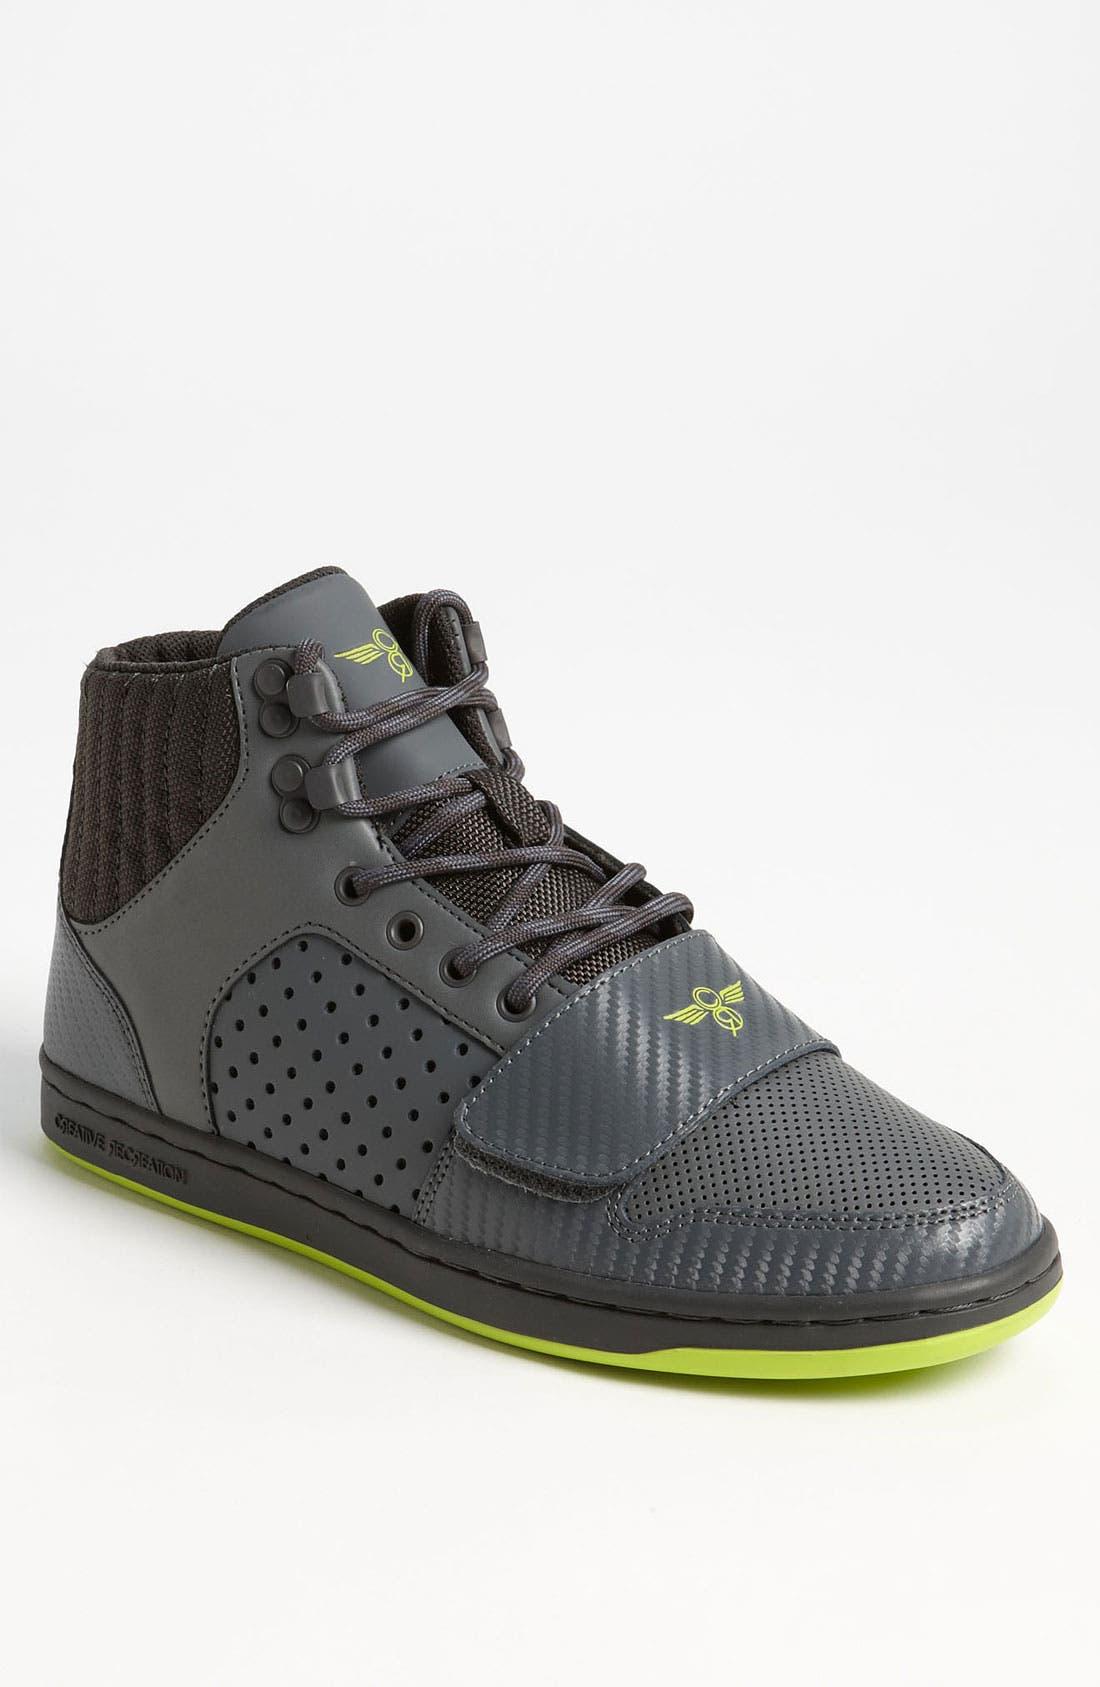 Alternate Image 1 Selected - Creative Recreation 'Cesario' High Top Sneaker (Men)